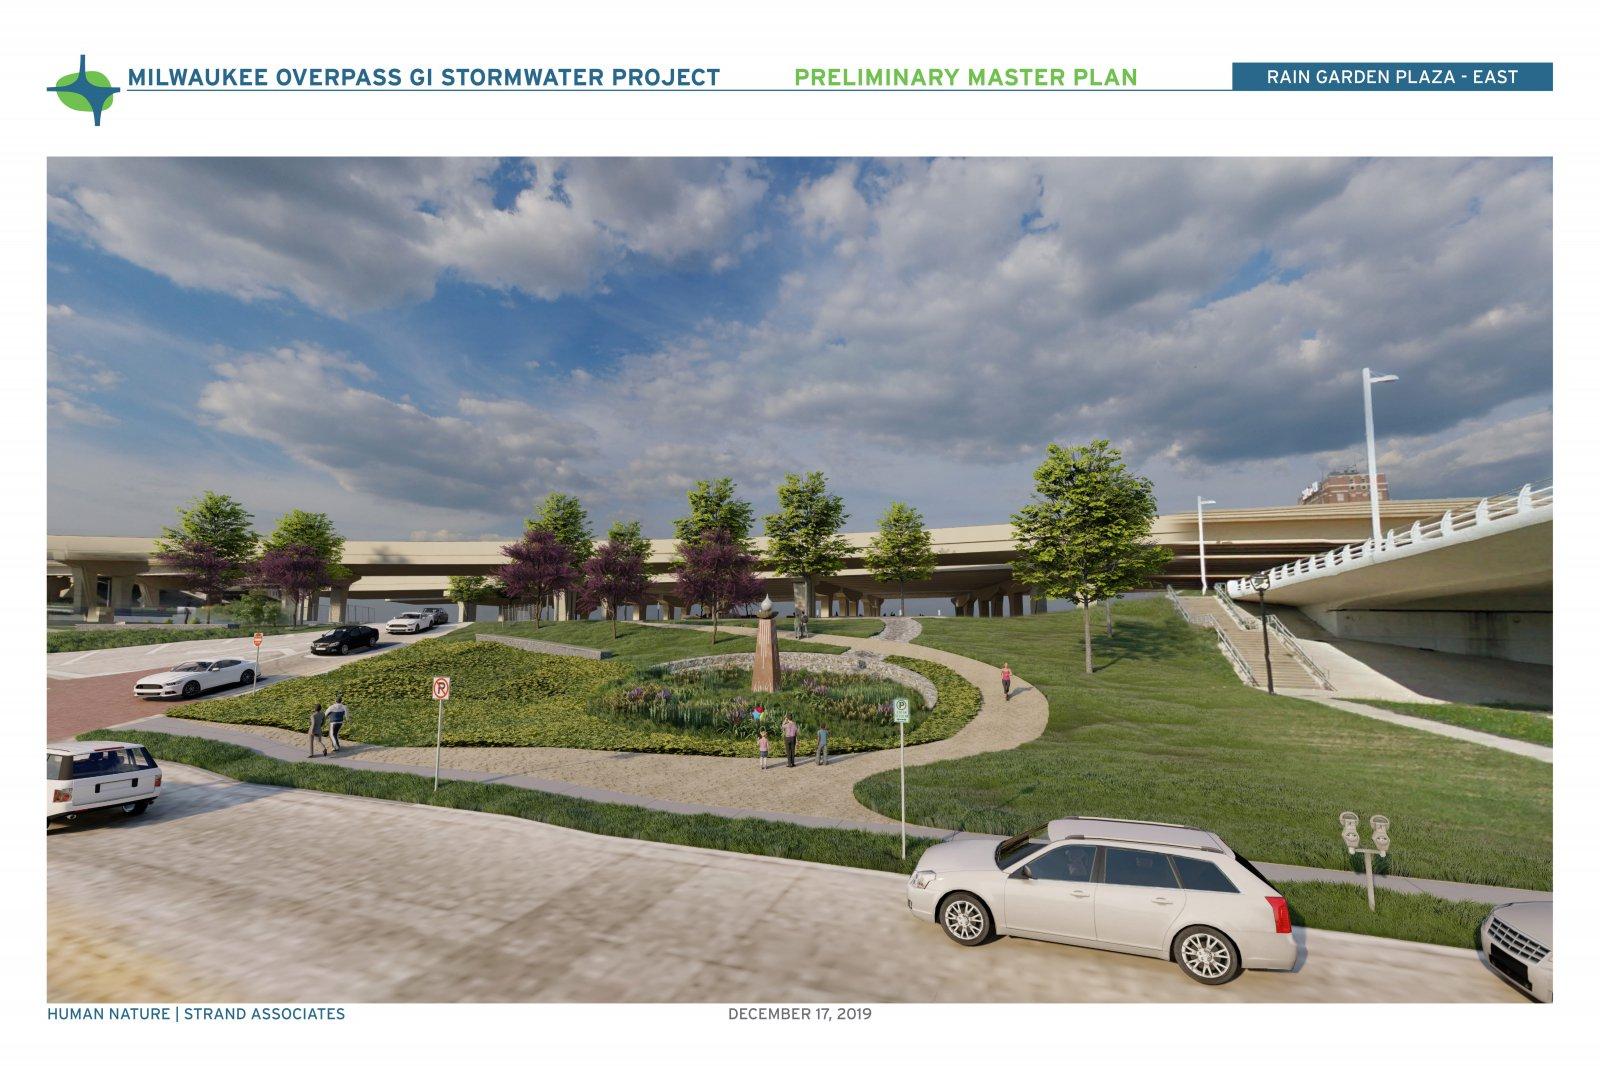 Milwaukee Overpass GI Stormwater Project Rendering